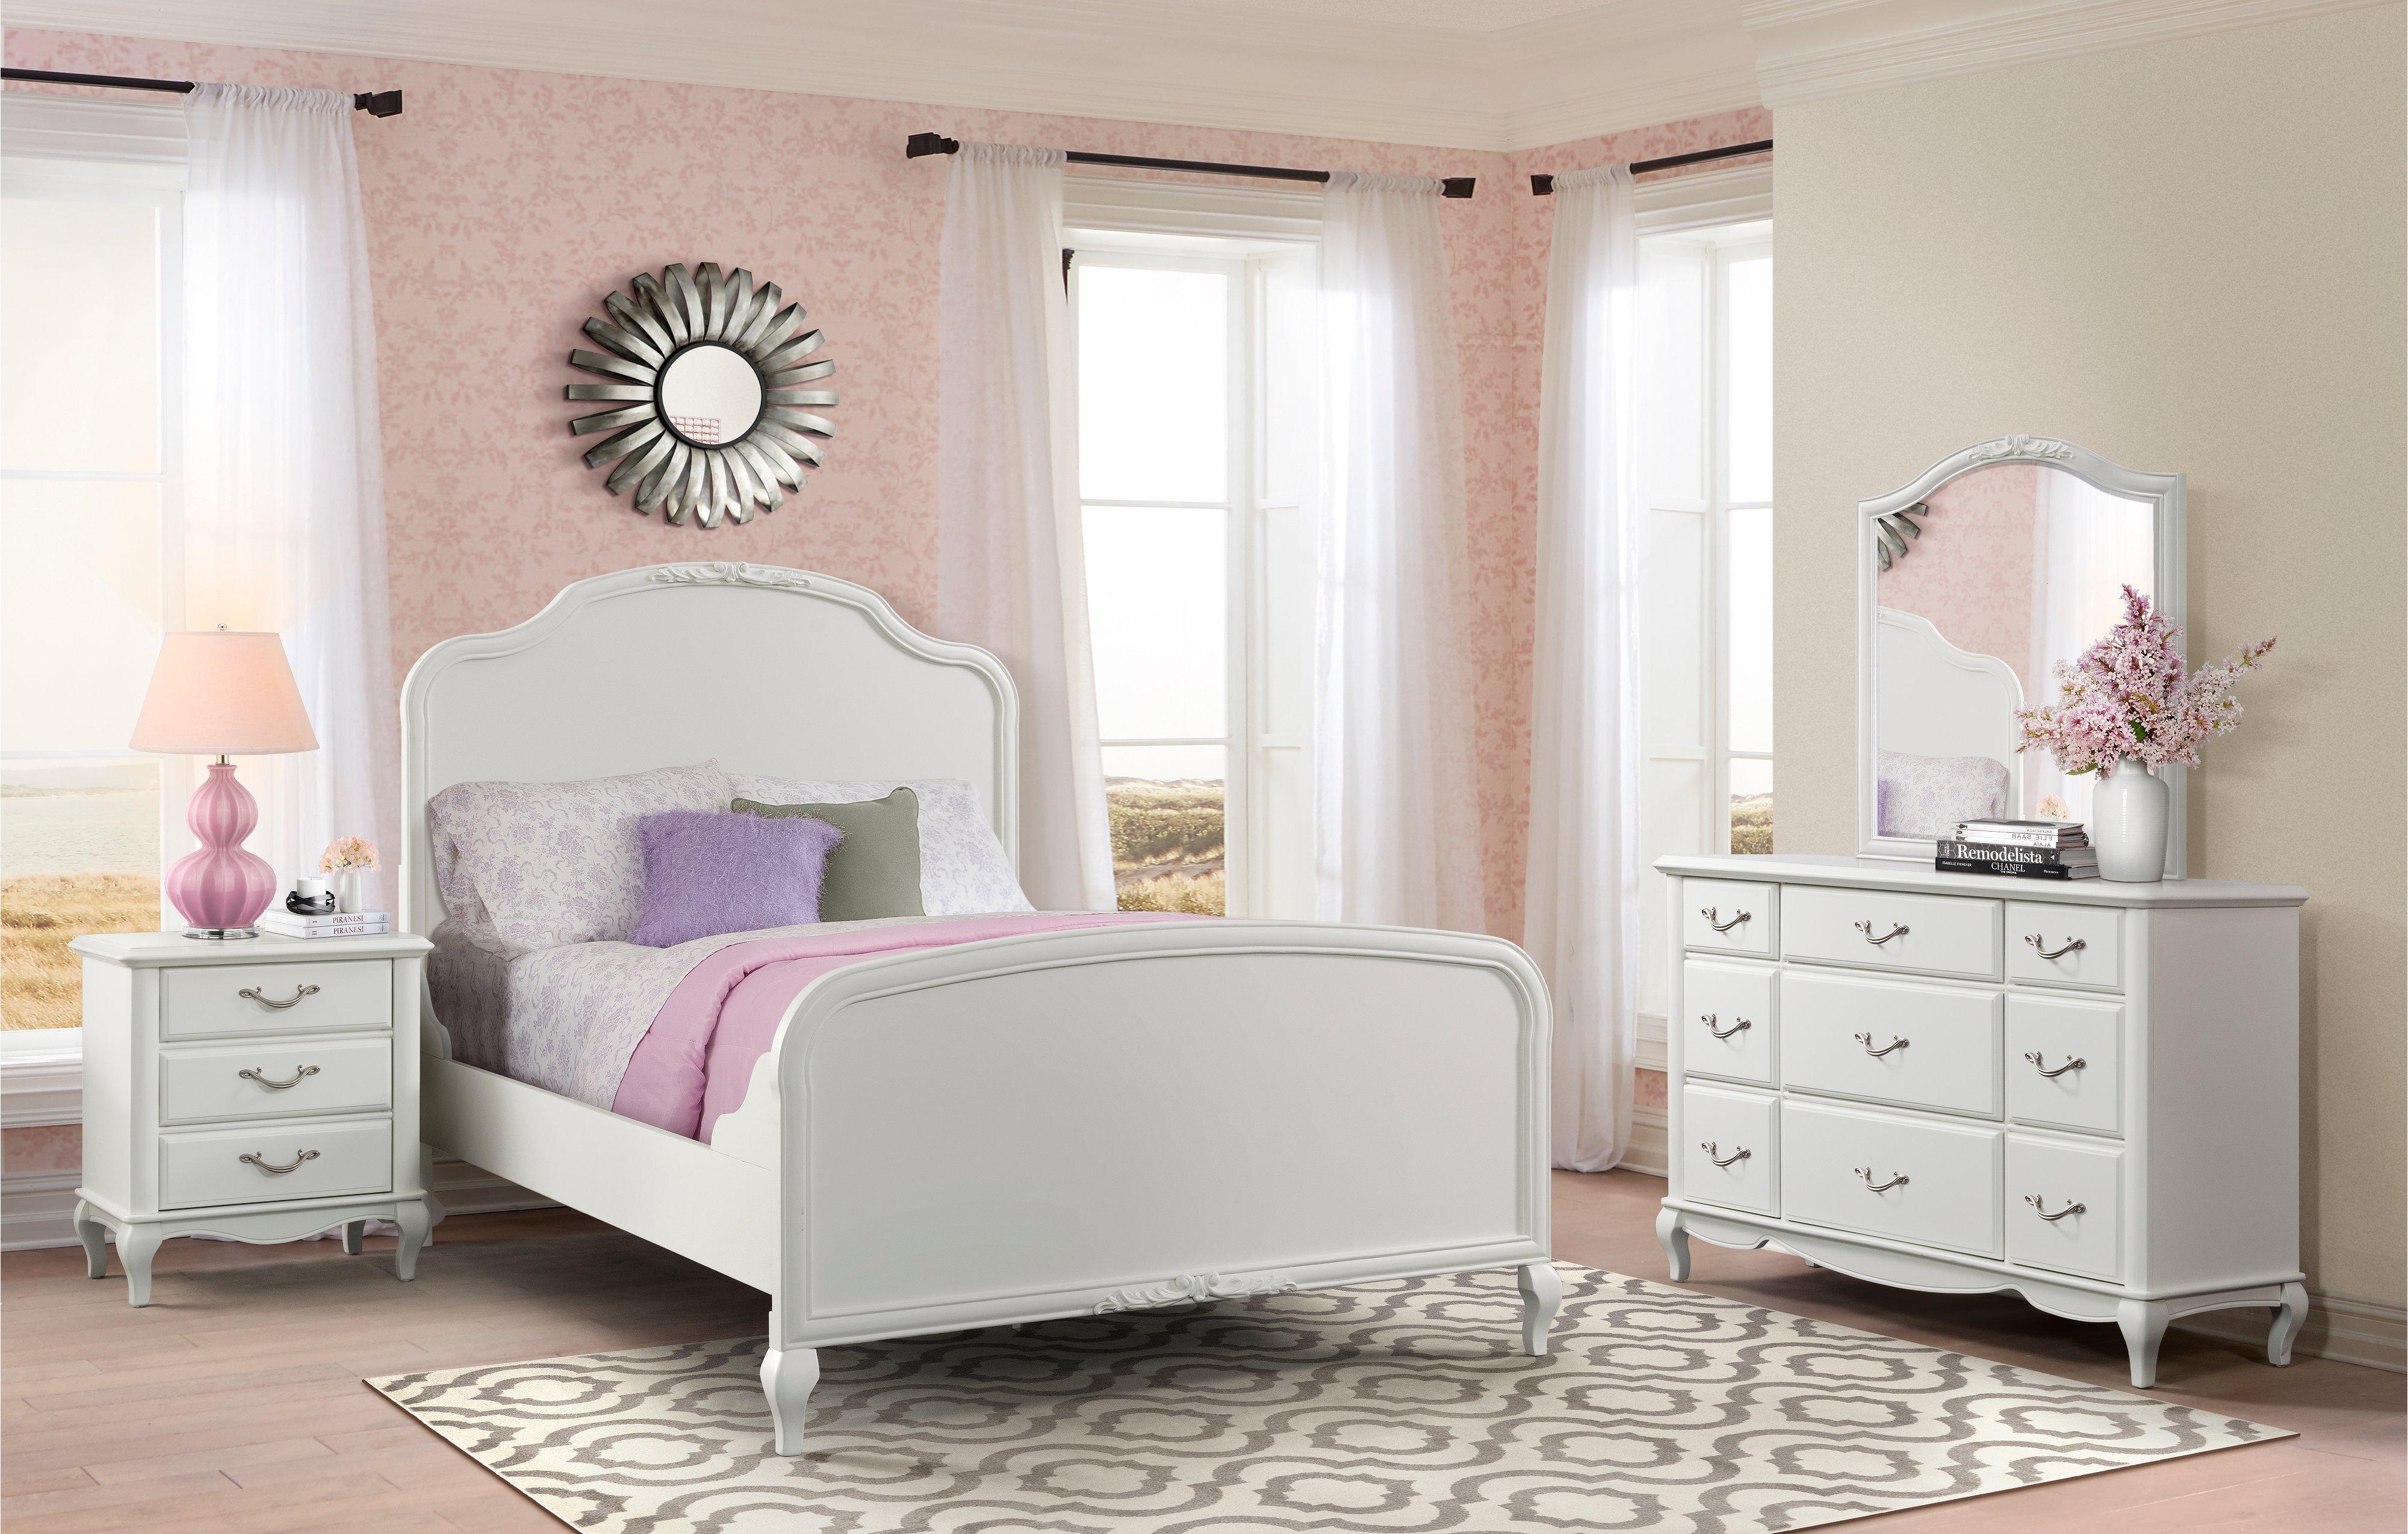 Furniture Store Vaughan Bassett Living Room Bedroom Dining Decor Rc Willey